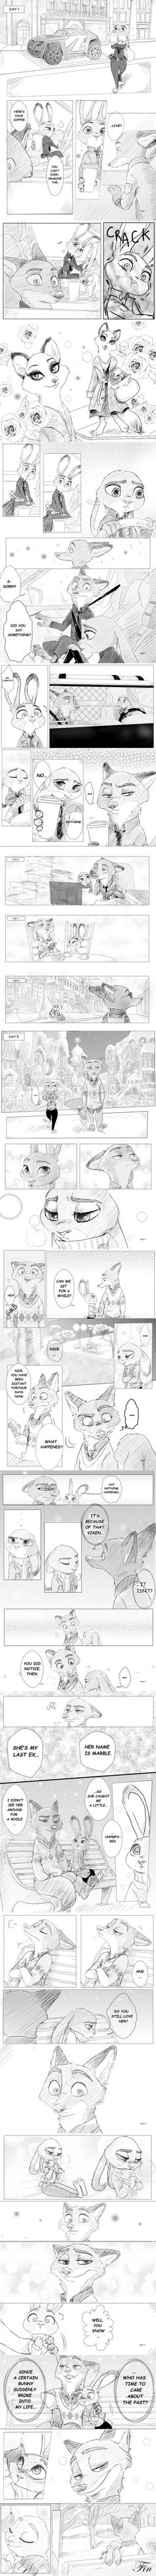 Zootopia comic (by Rem289)